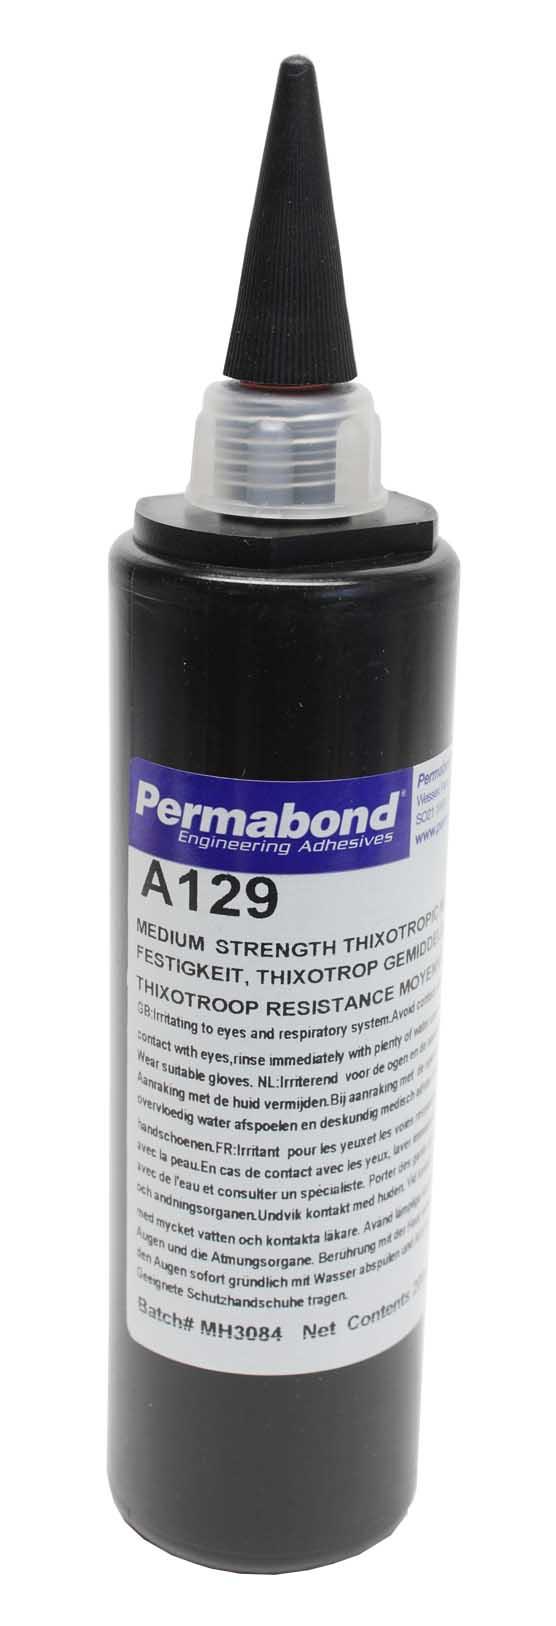 Permabond A129